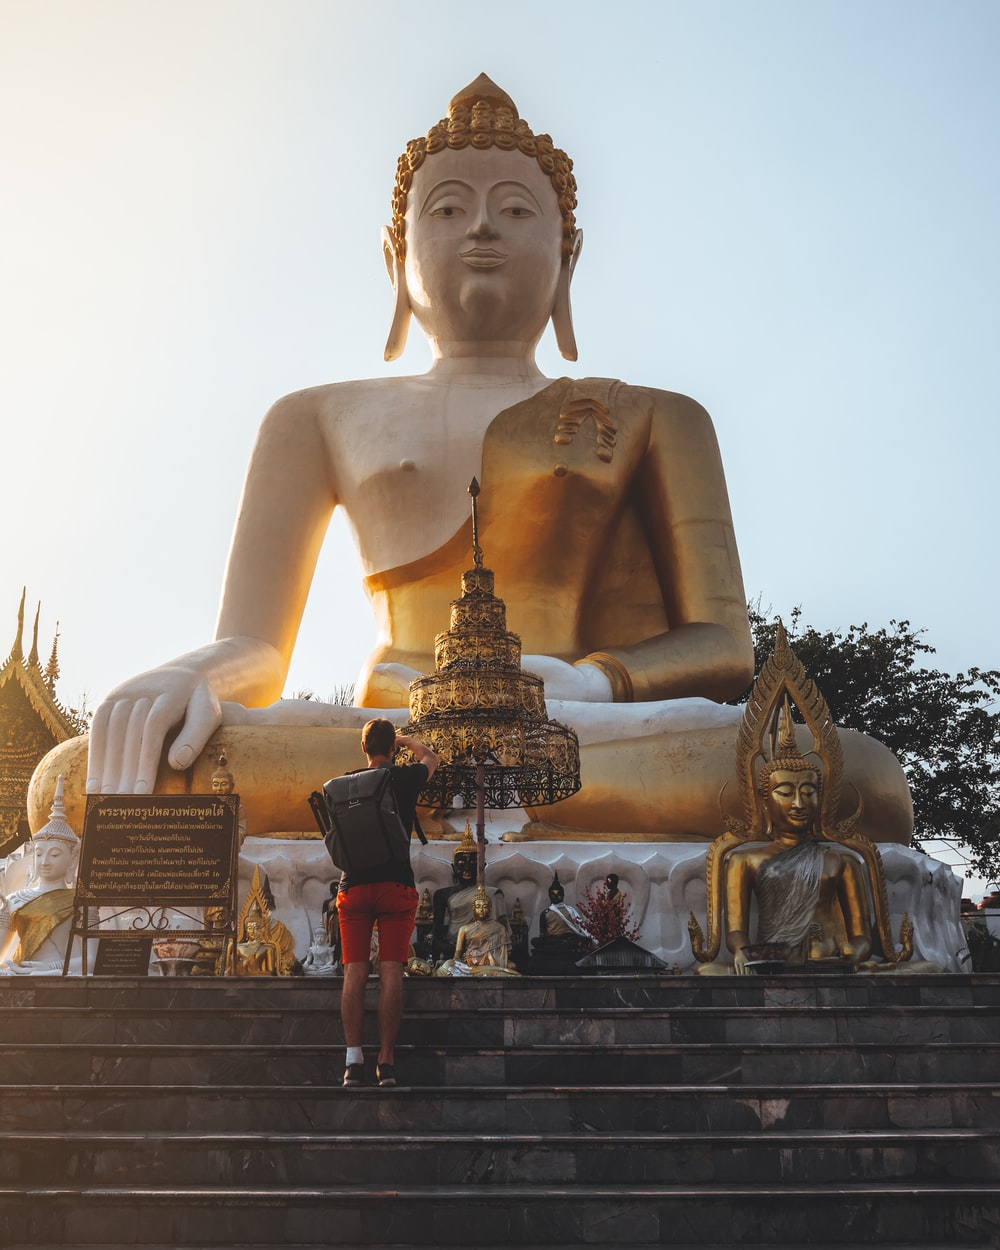 gold buddha statue under white sky during daytime